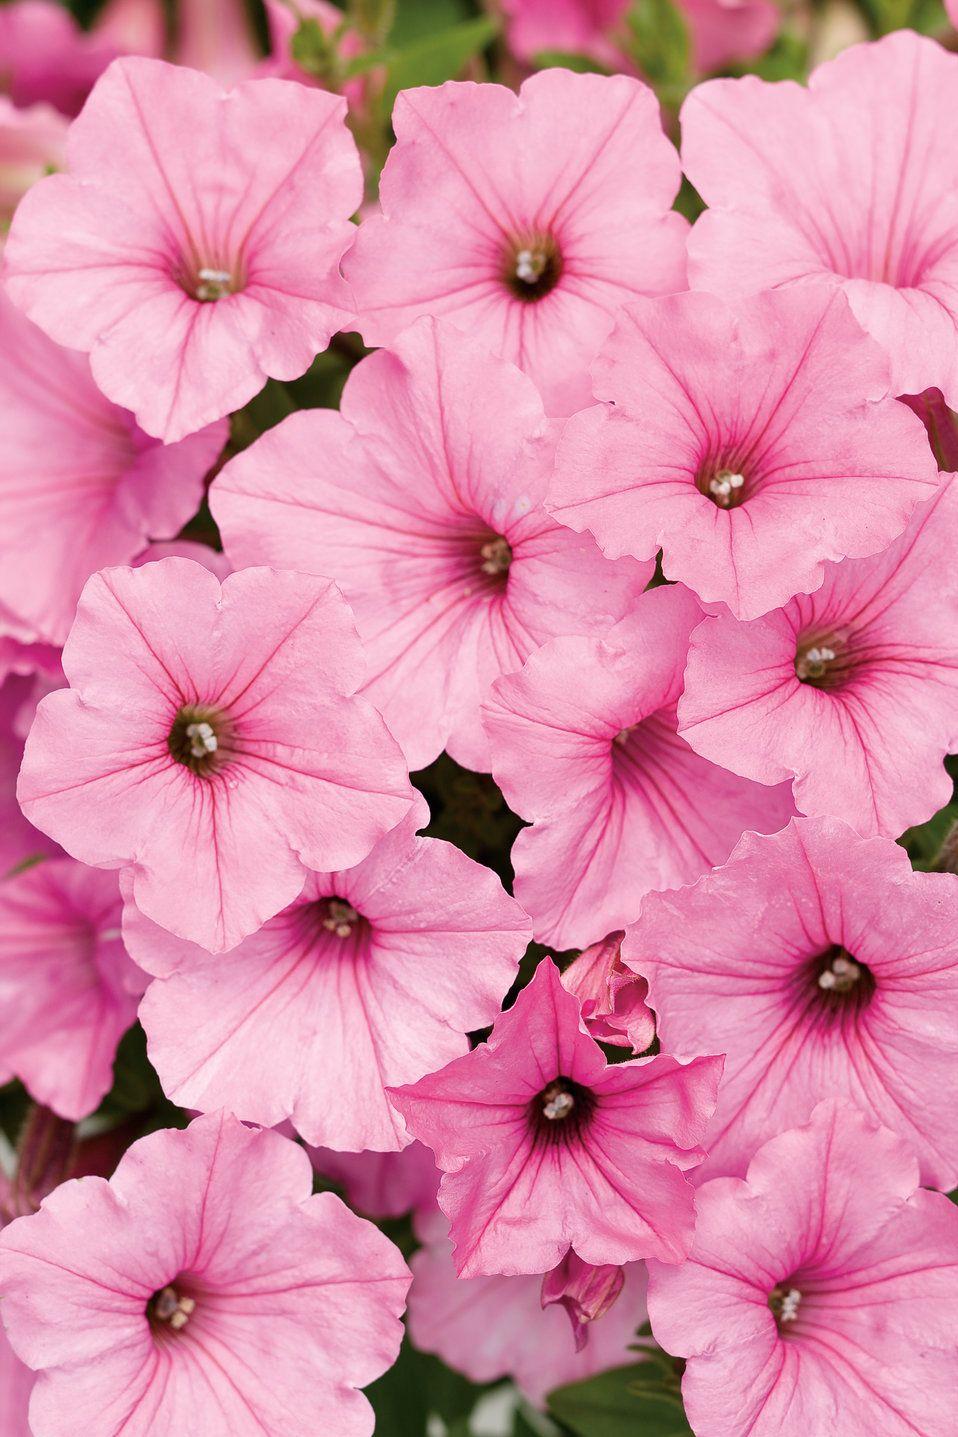 Supertunia Vista Bubblegum Petunia Hybrid Petunias Annual